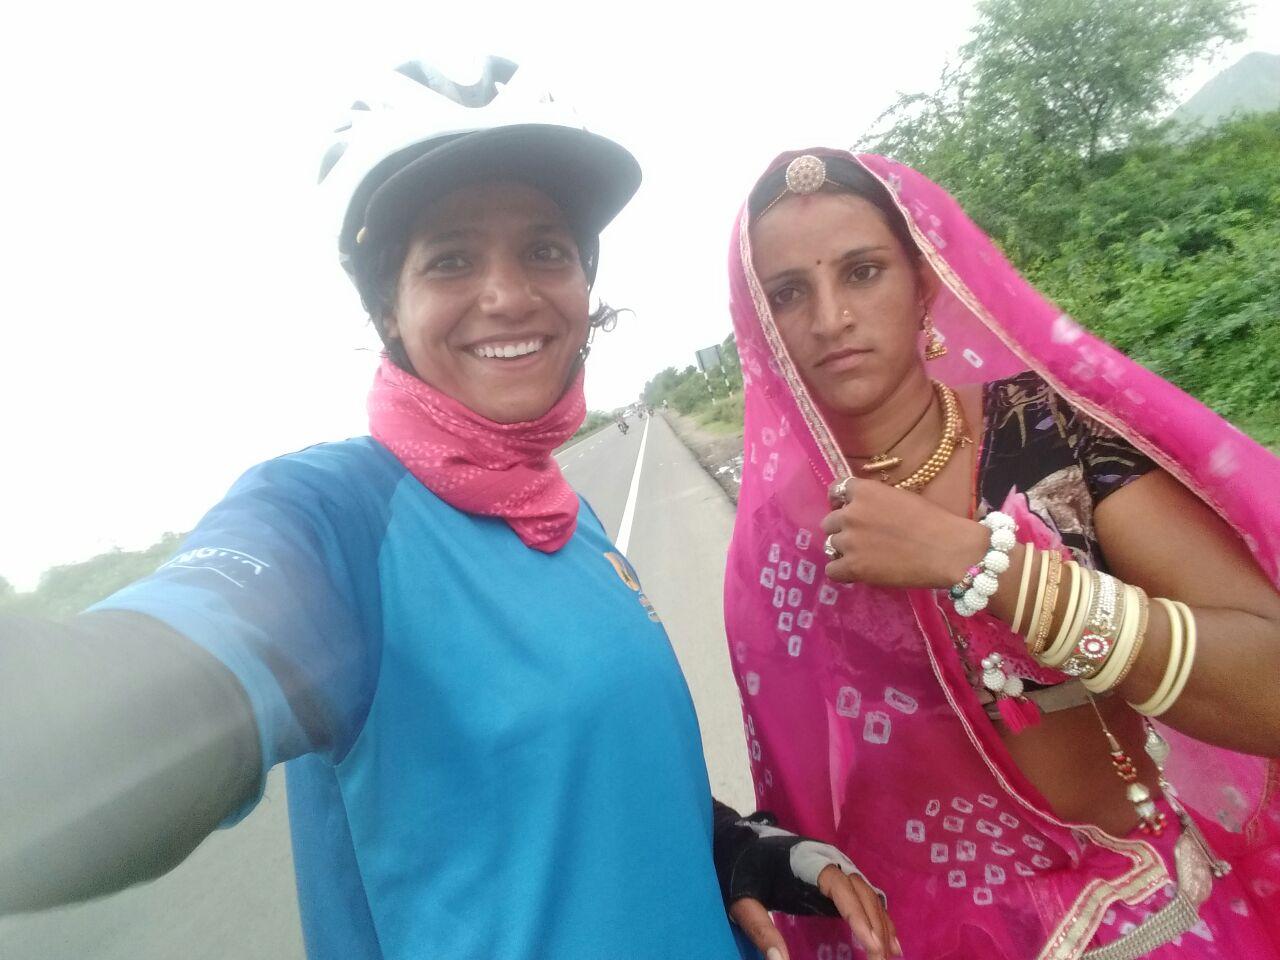 Sunita Singh Choken - Highway selfie